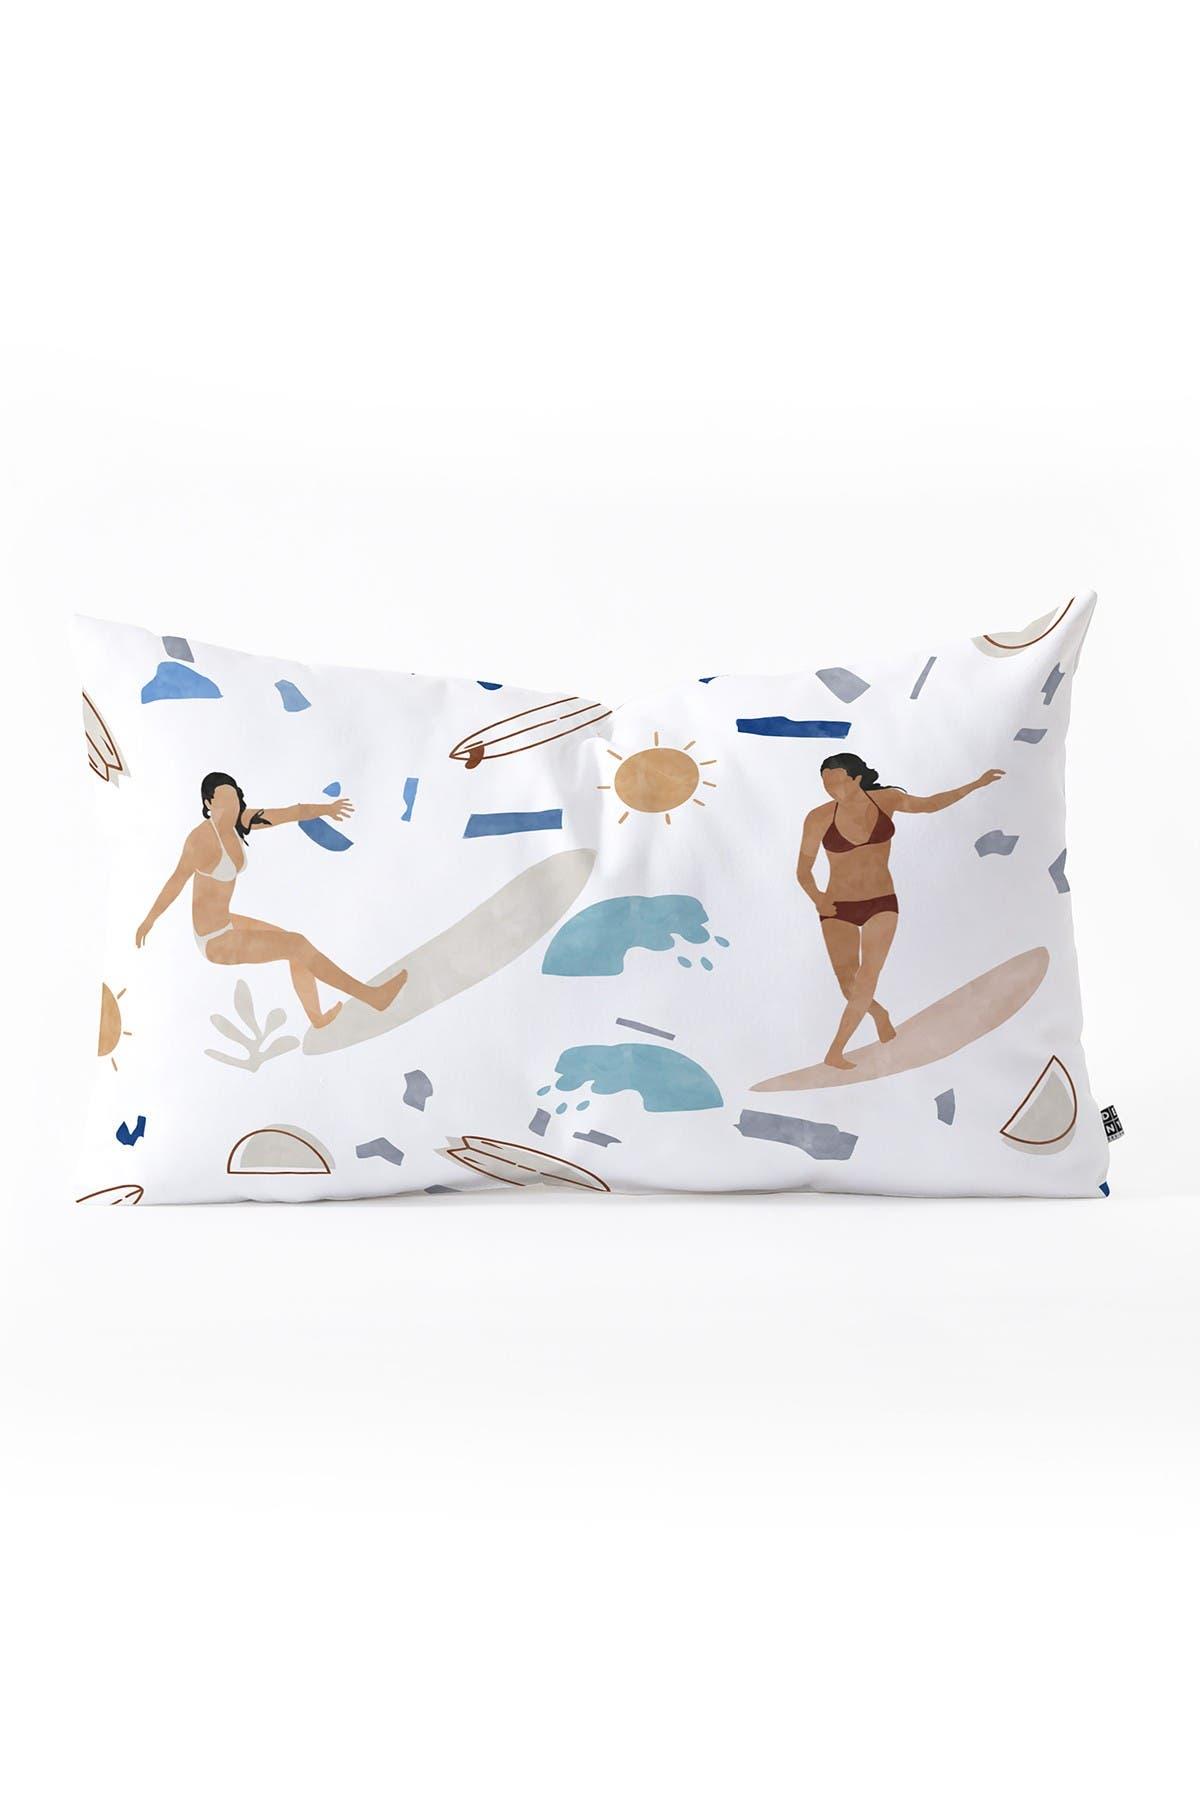 Image of Deny Designs Marta Barragan Camarasa Surfing the Terrazzo Sea Oblong Throw Pillow